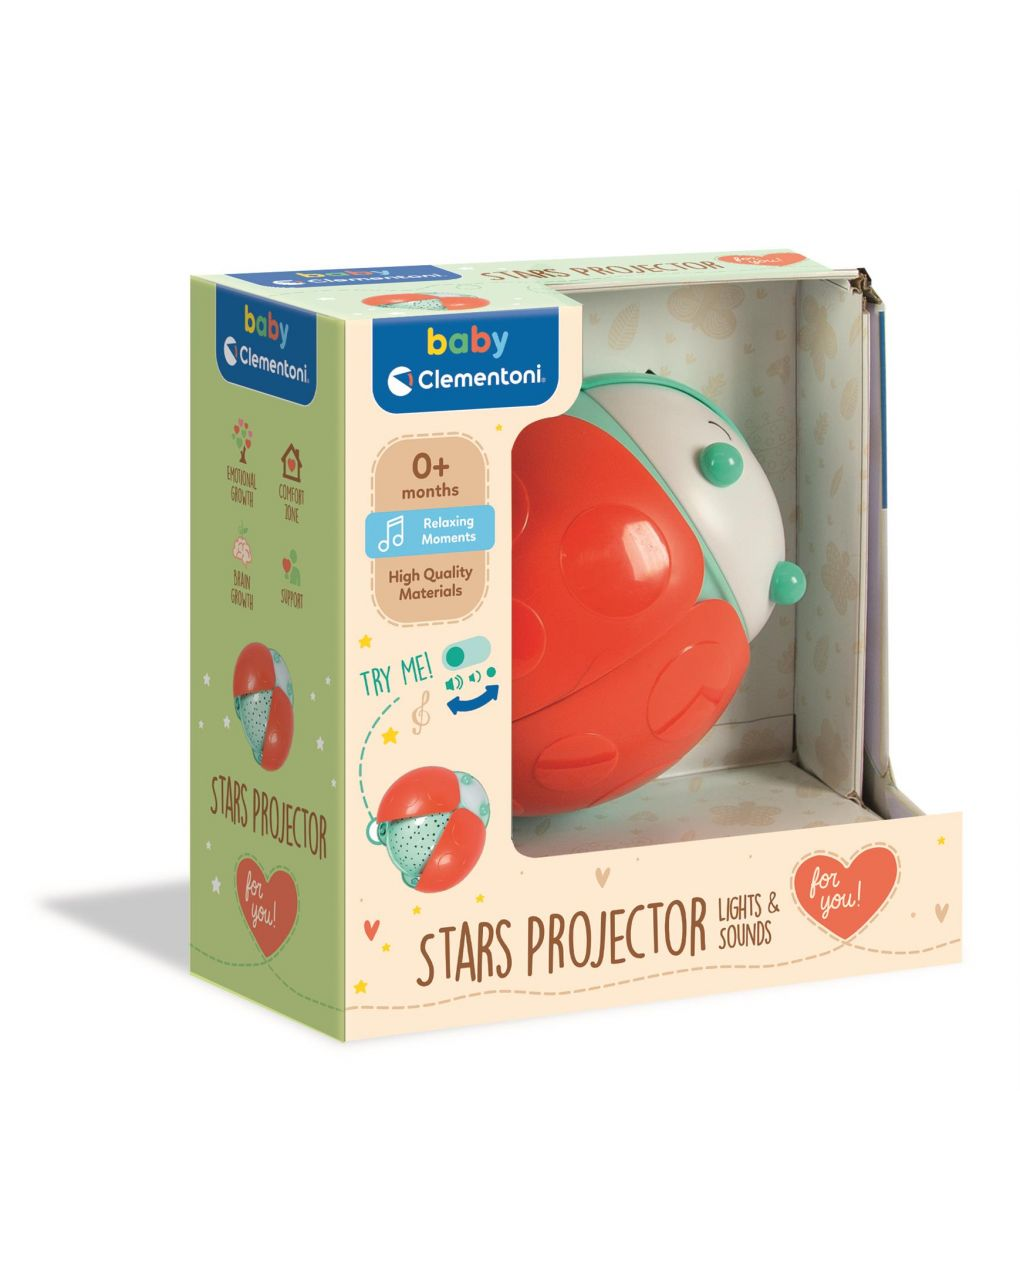 Baby clementoni - light & sounds stars projector - Clementoni